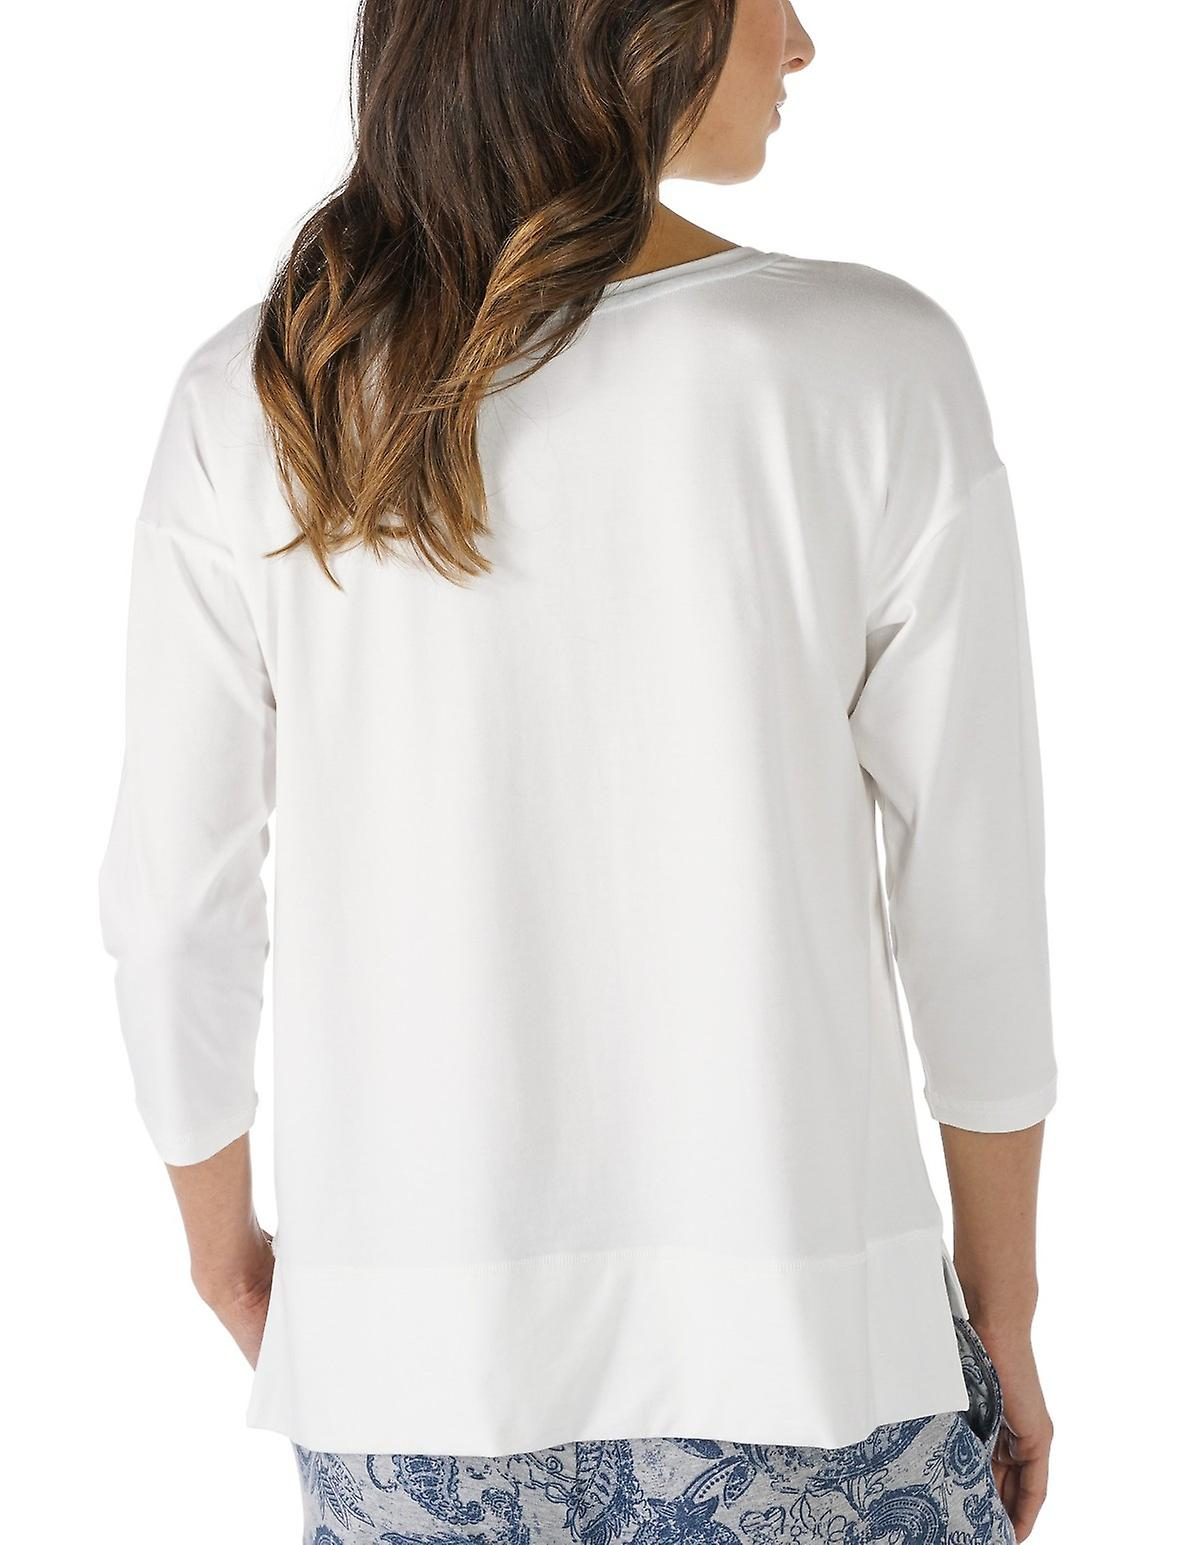 Night2Day Couleur unie écru pyjama 3 4 Sleeve Pyjama Top féminin de Mey 16806-405